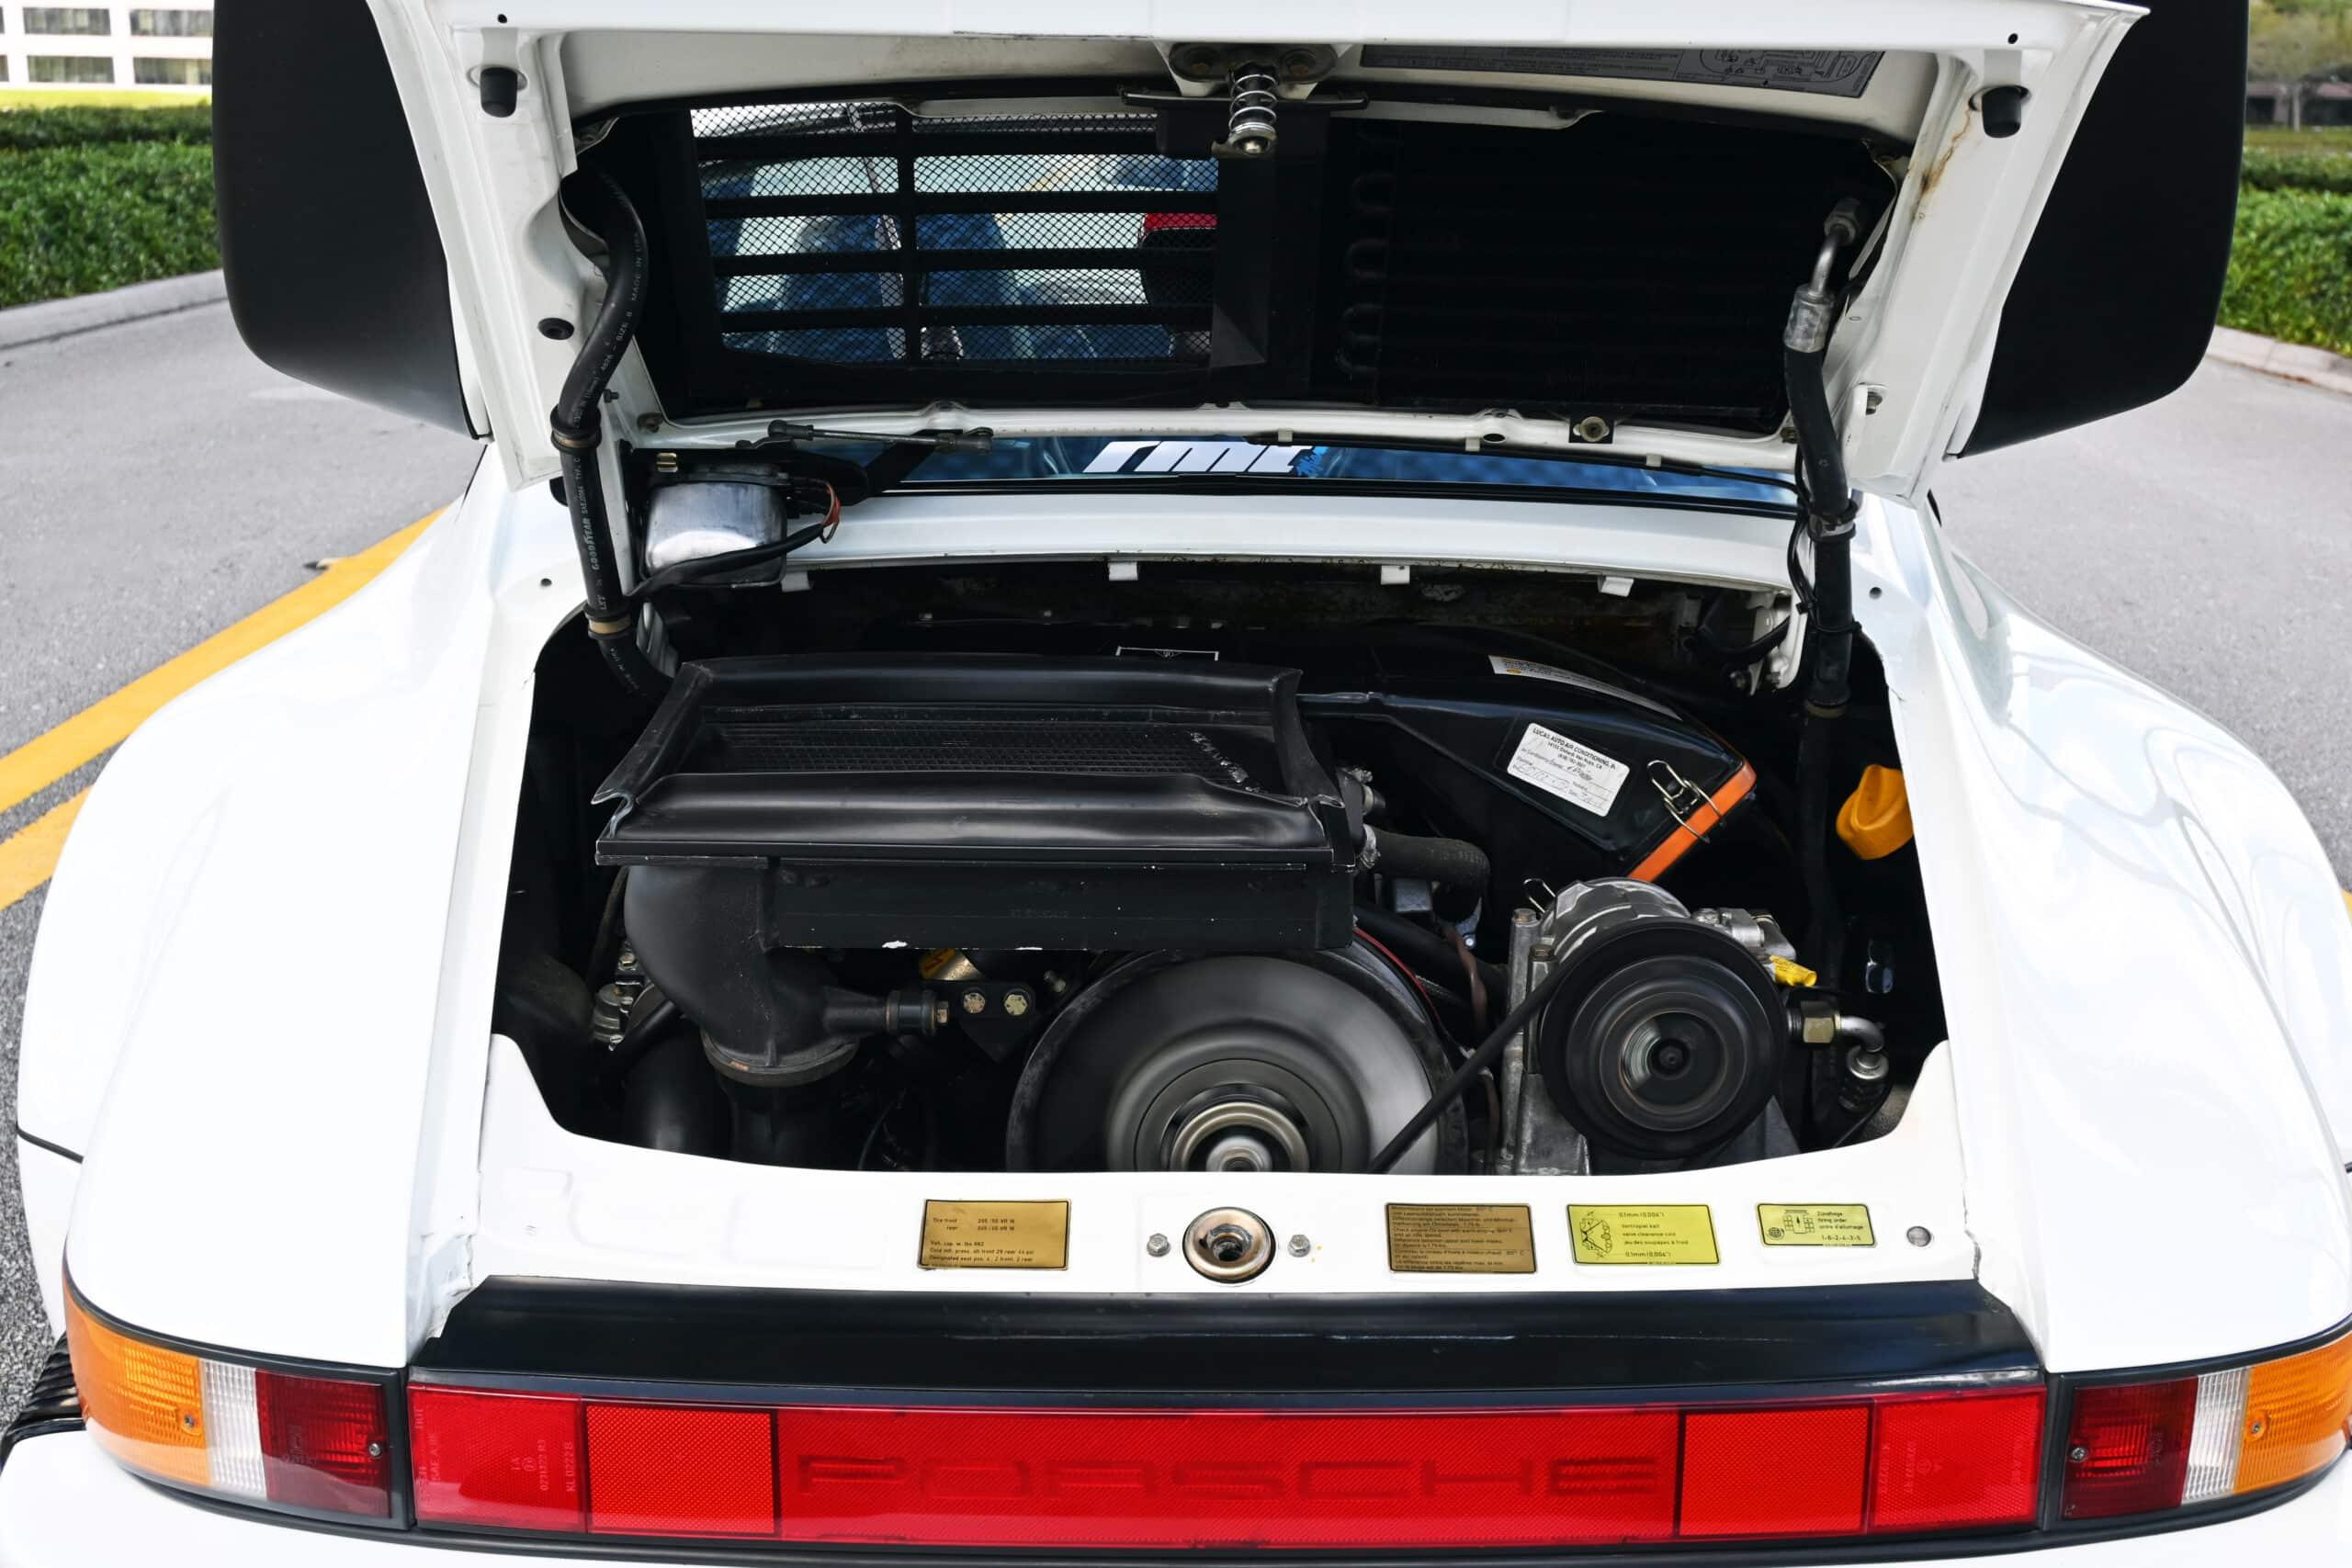 1987 Porsche 911 (930) Turbo, just 40K documented miles since new, Original paint, California car, CoA